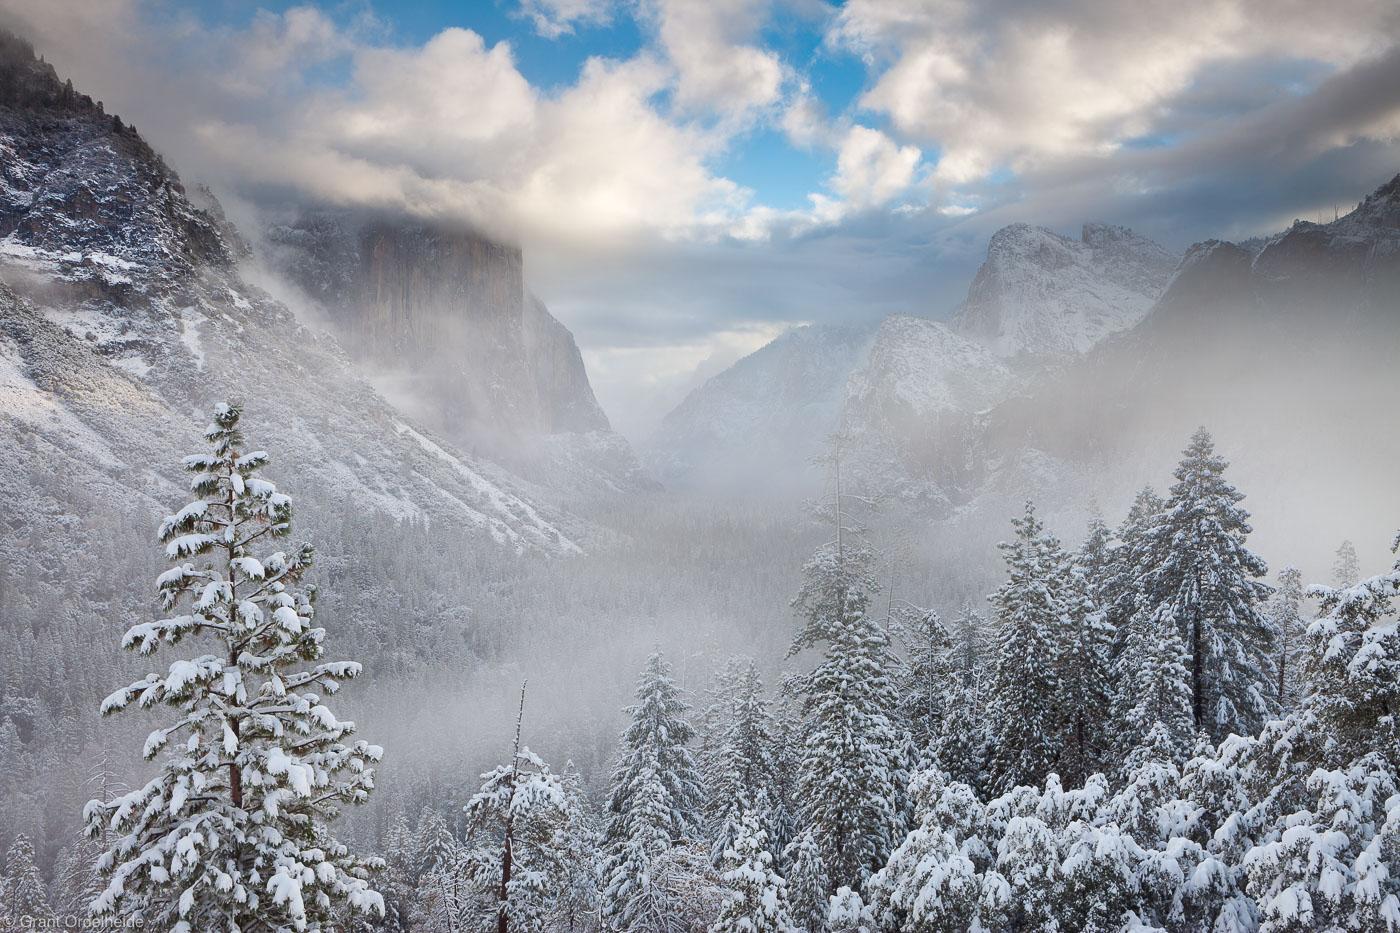 yosemite, valley, winter, national park, california, usa, storm, blanket, white, snow, photo